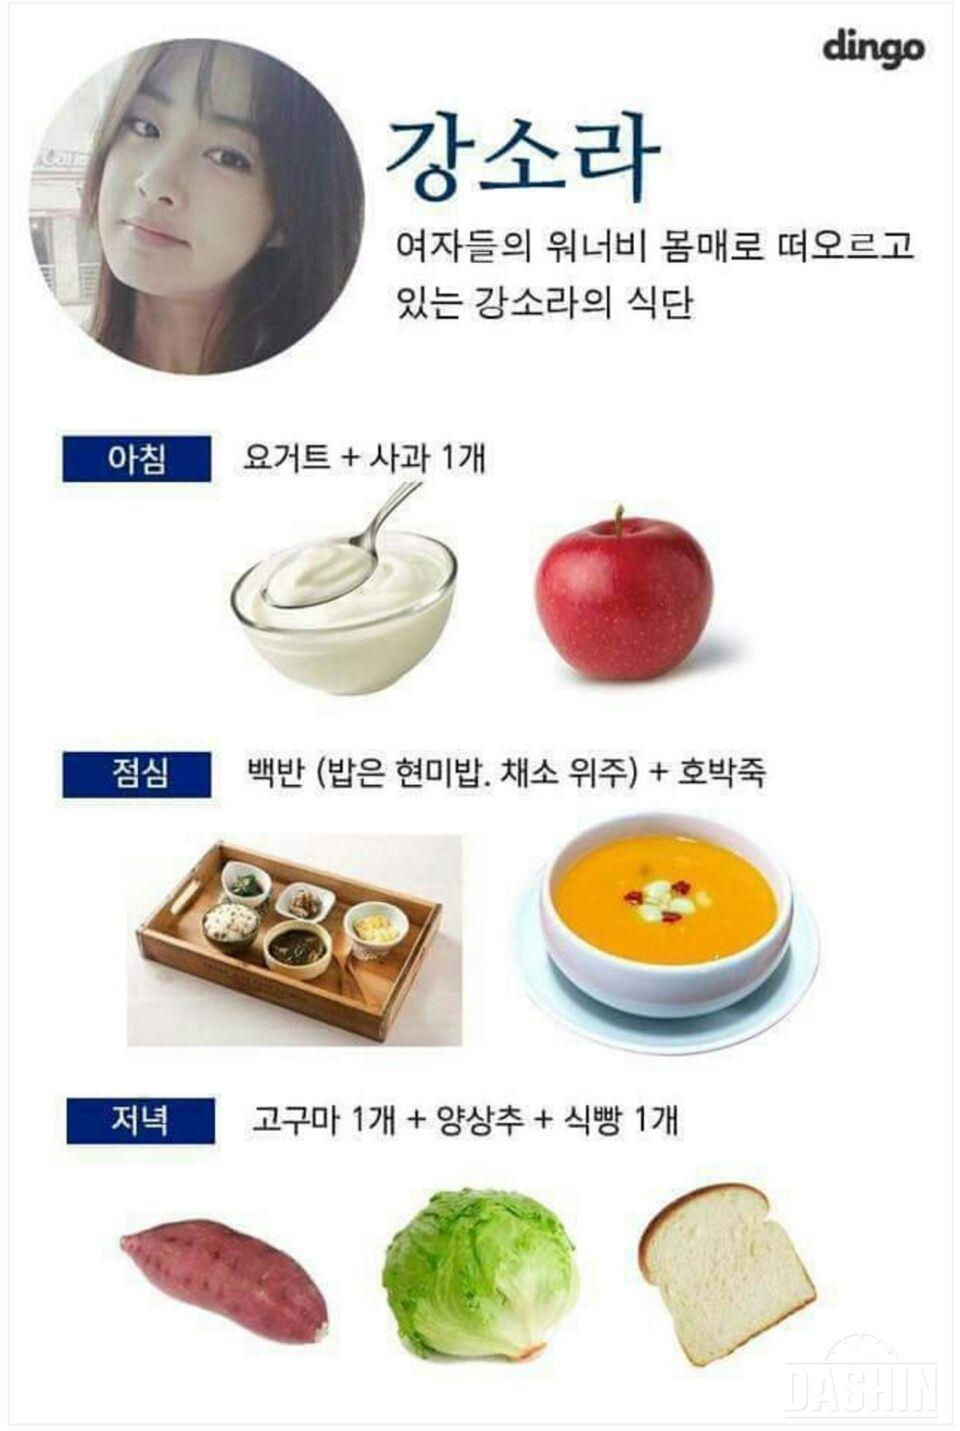 wm 271669 1452411892 3 - Rahasia Menu Diet 10 Artis Cantik Korea